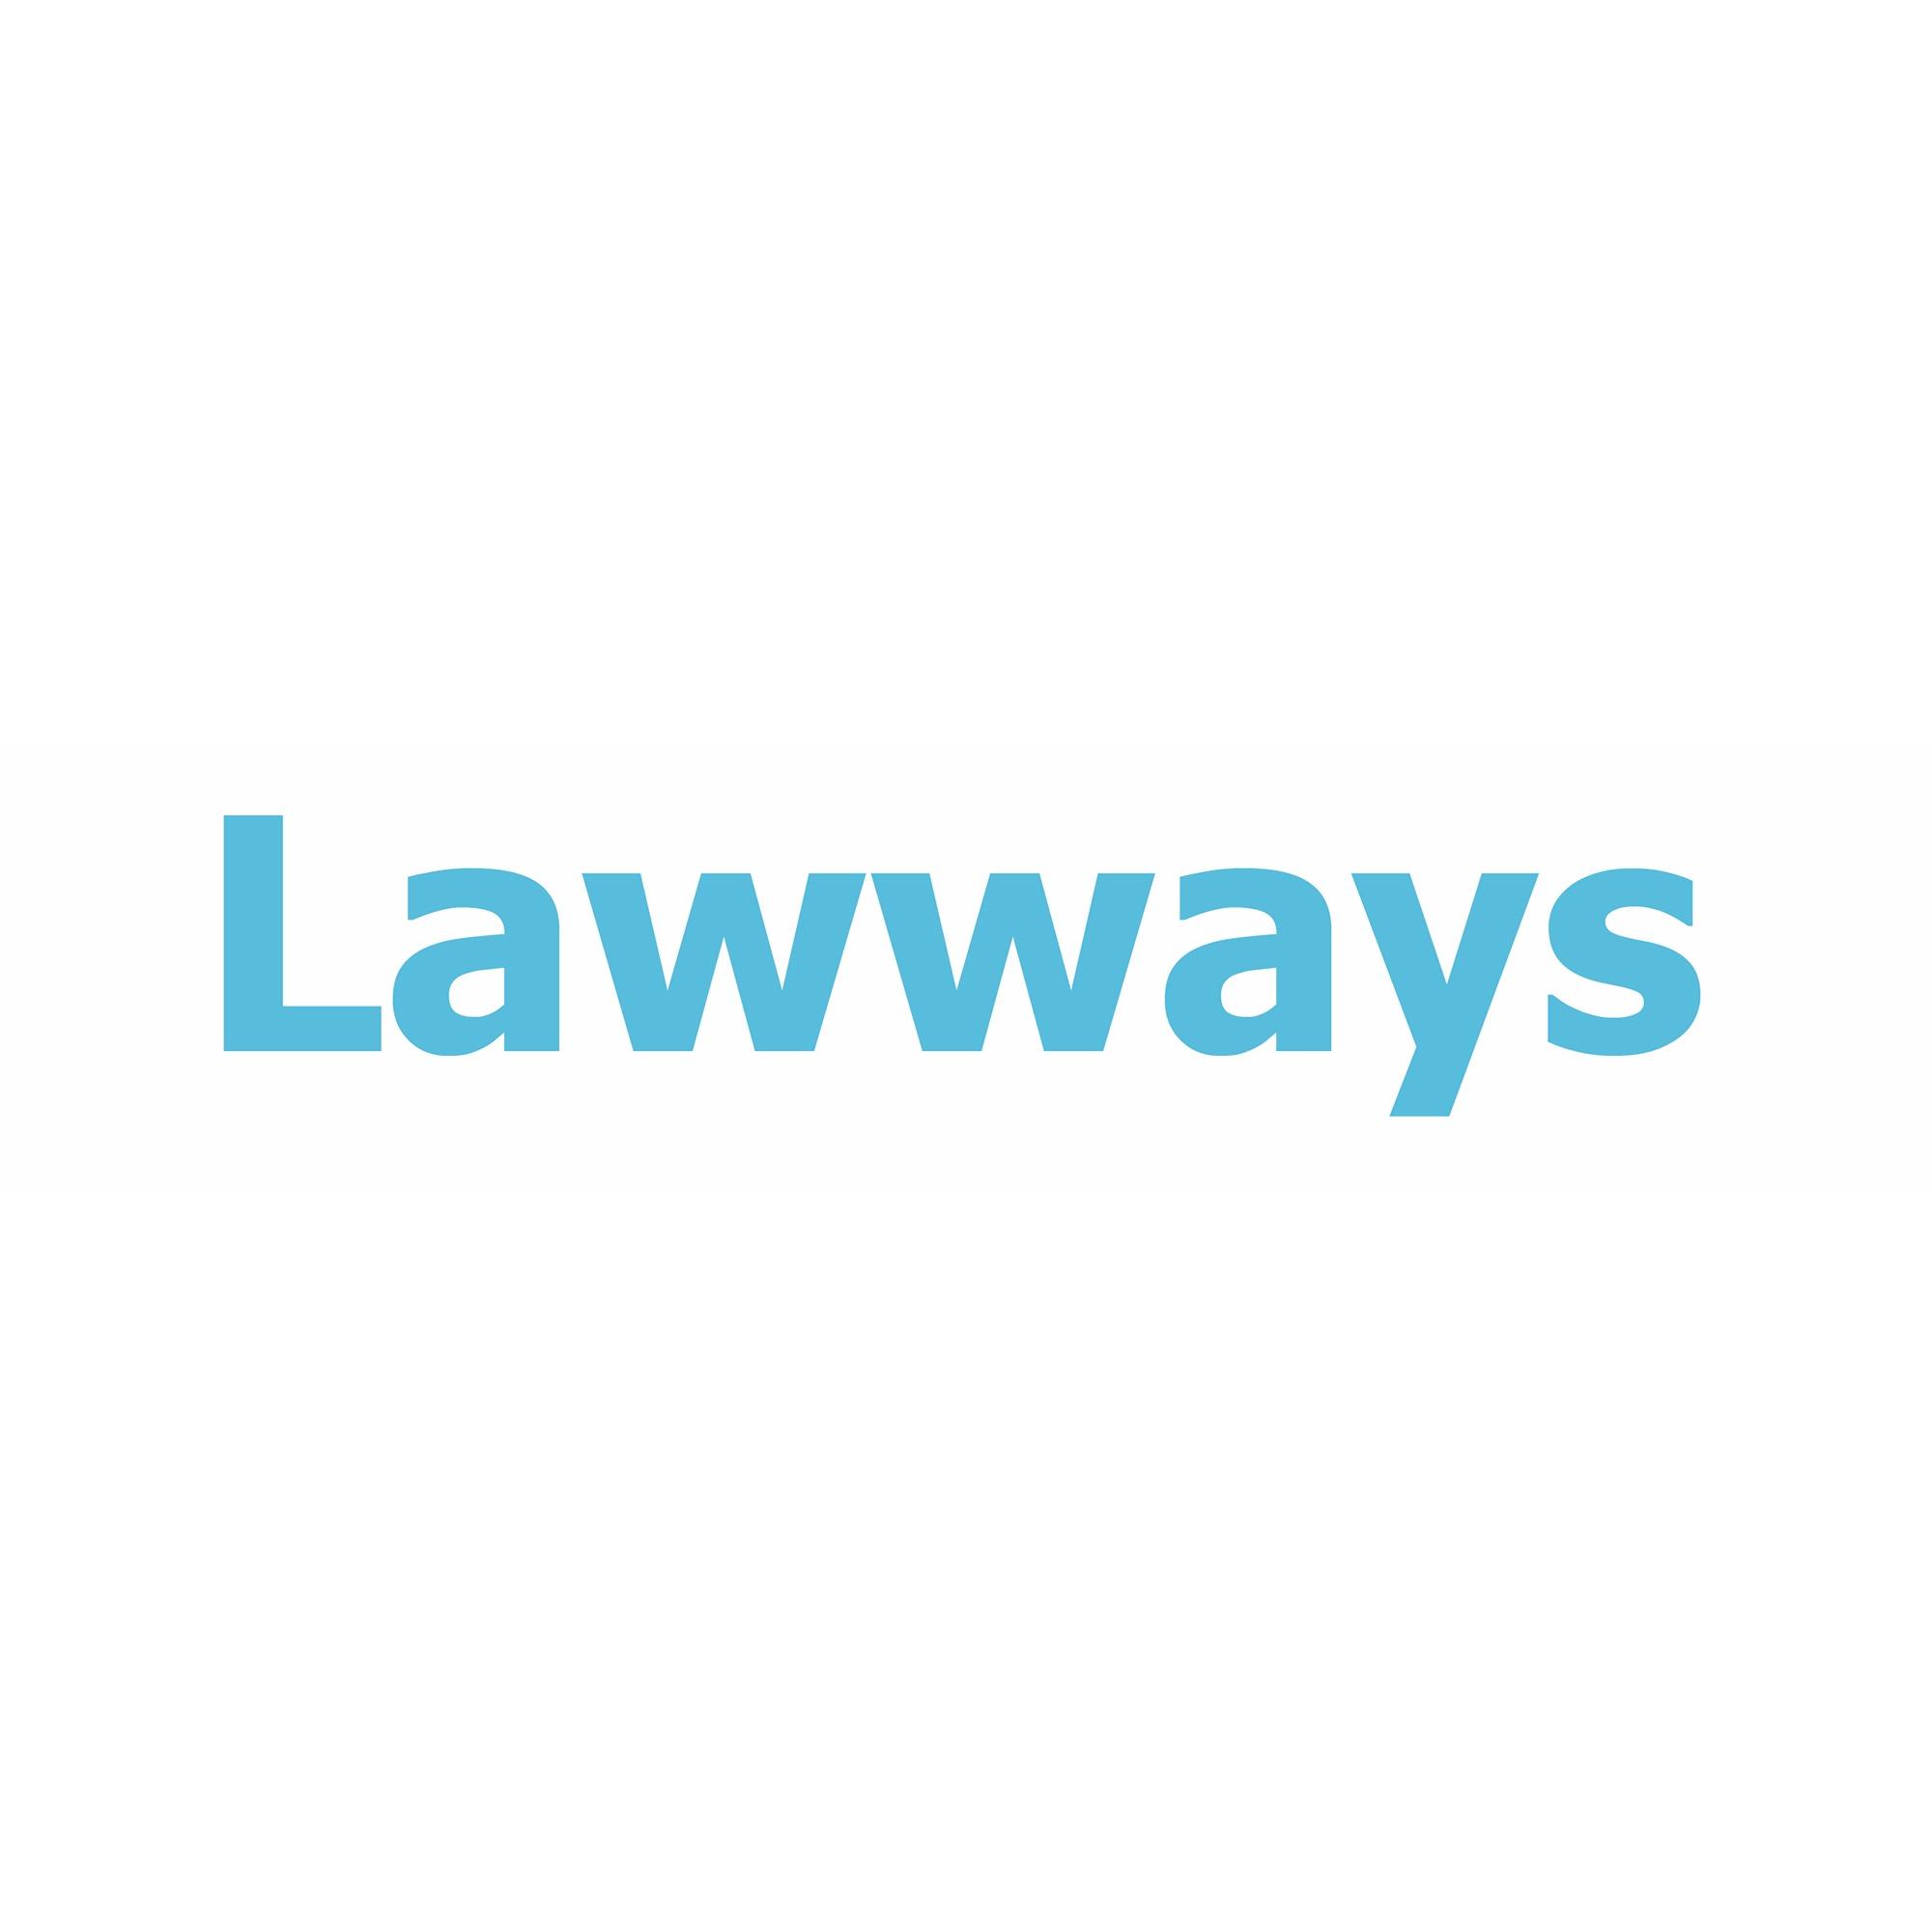 the Lawways logo.